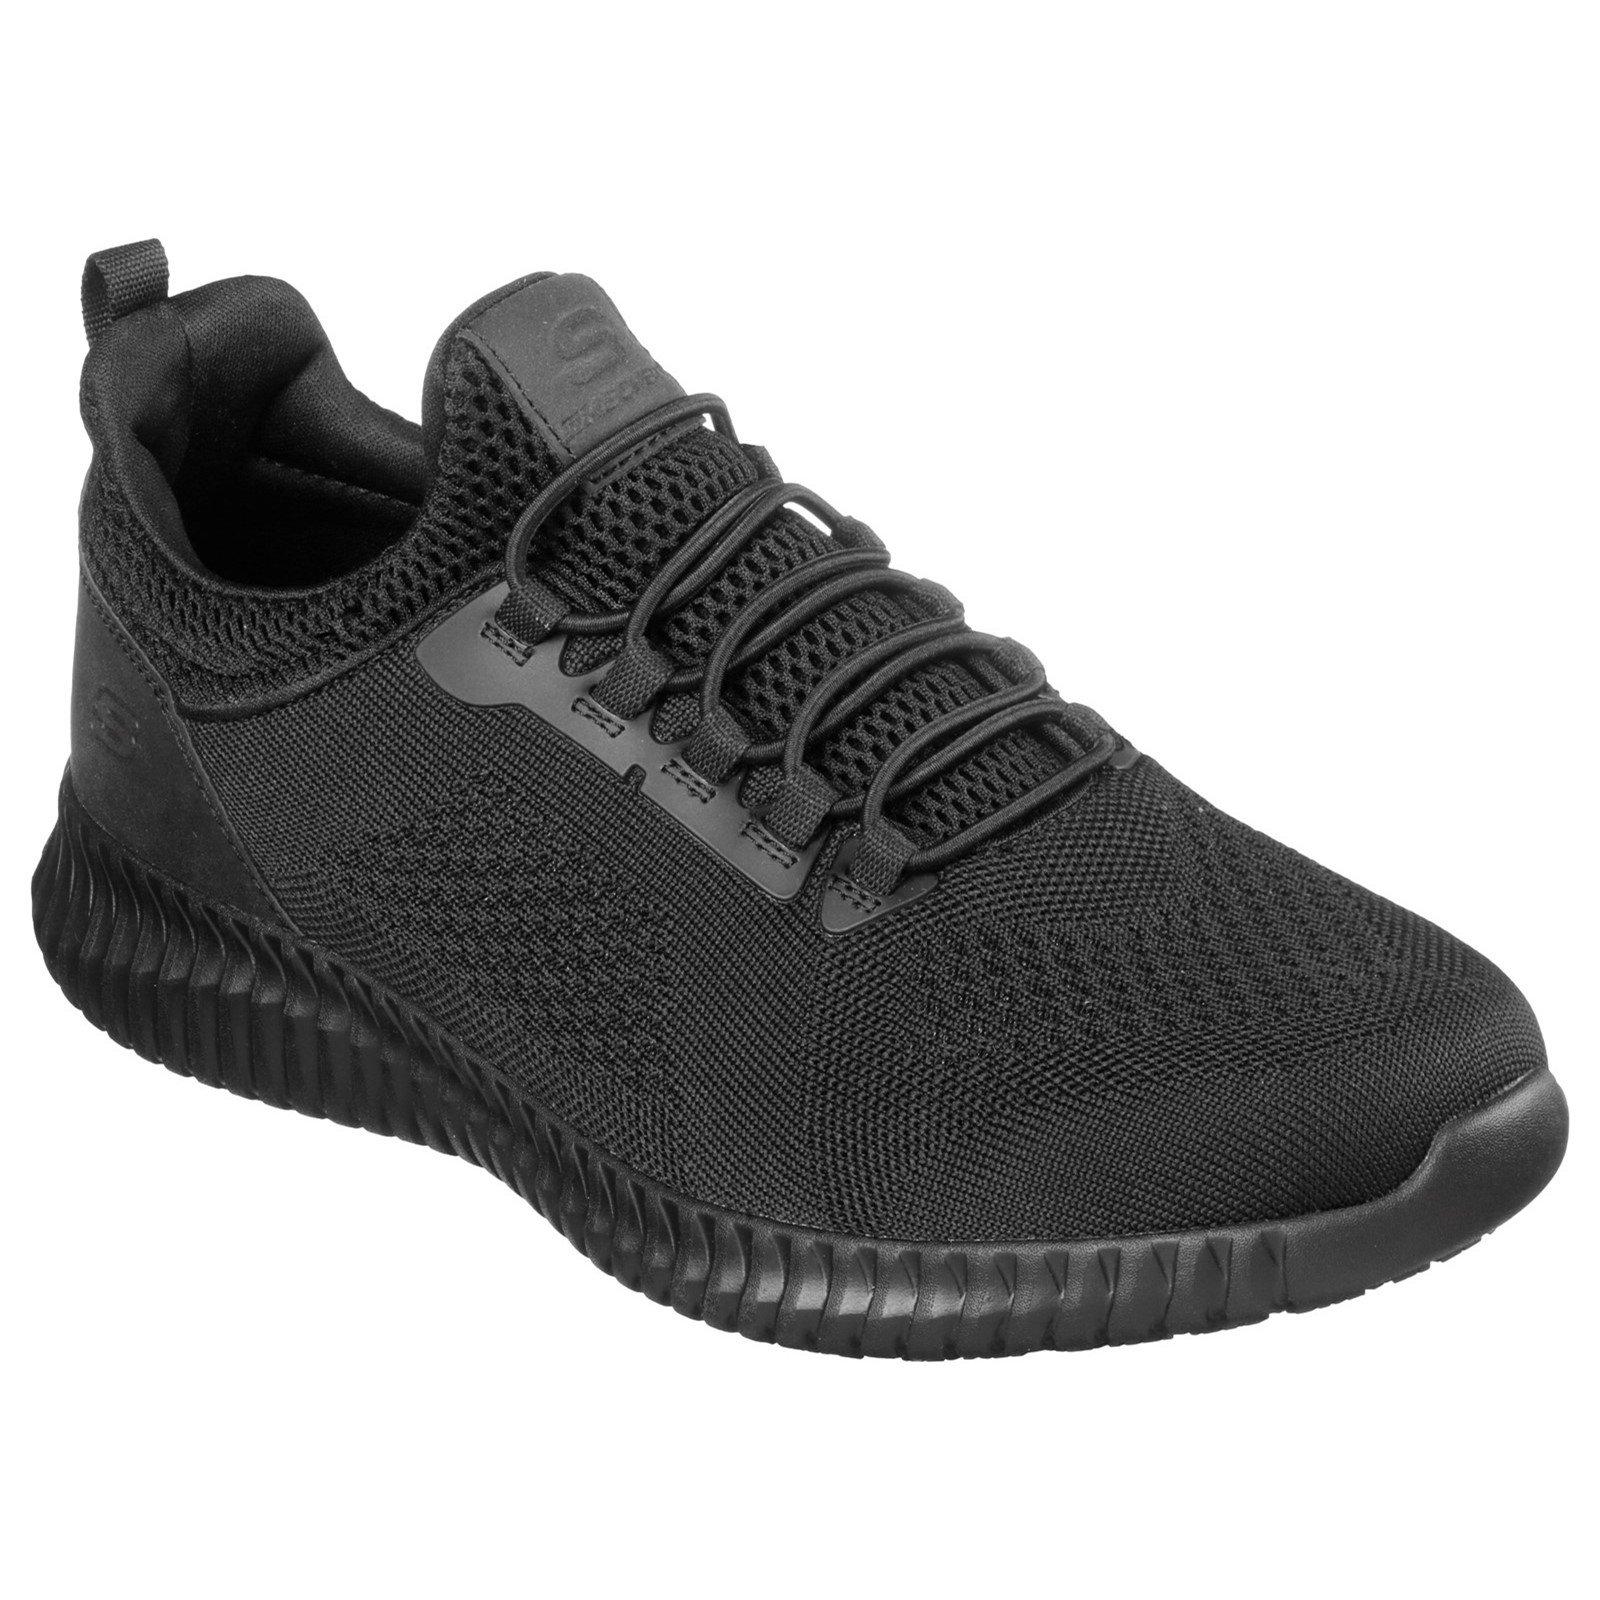 Skechers Unisex Cessnock Trainer Black 32620 - Black 10